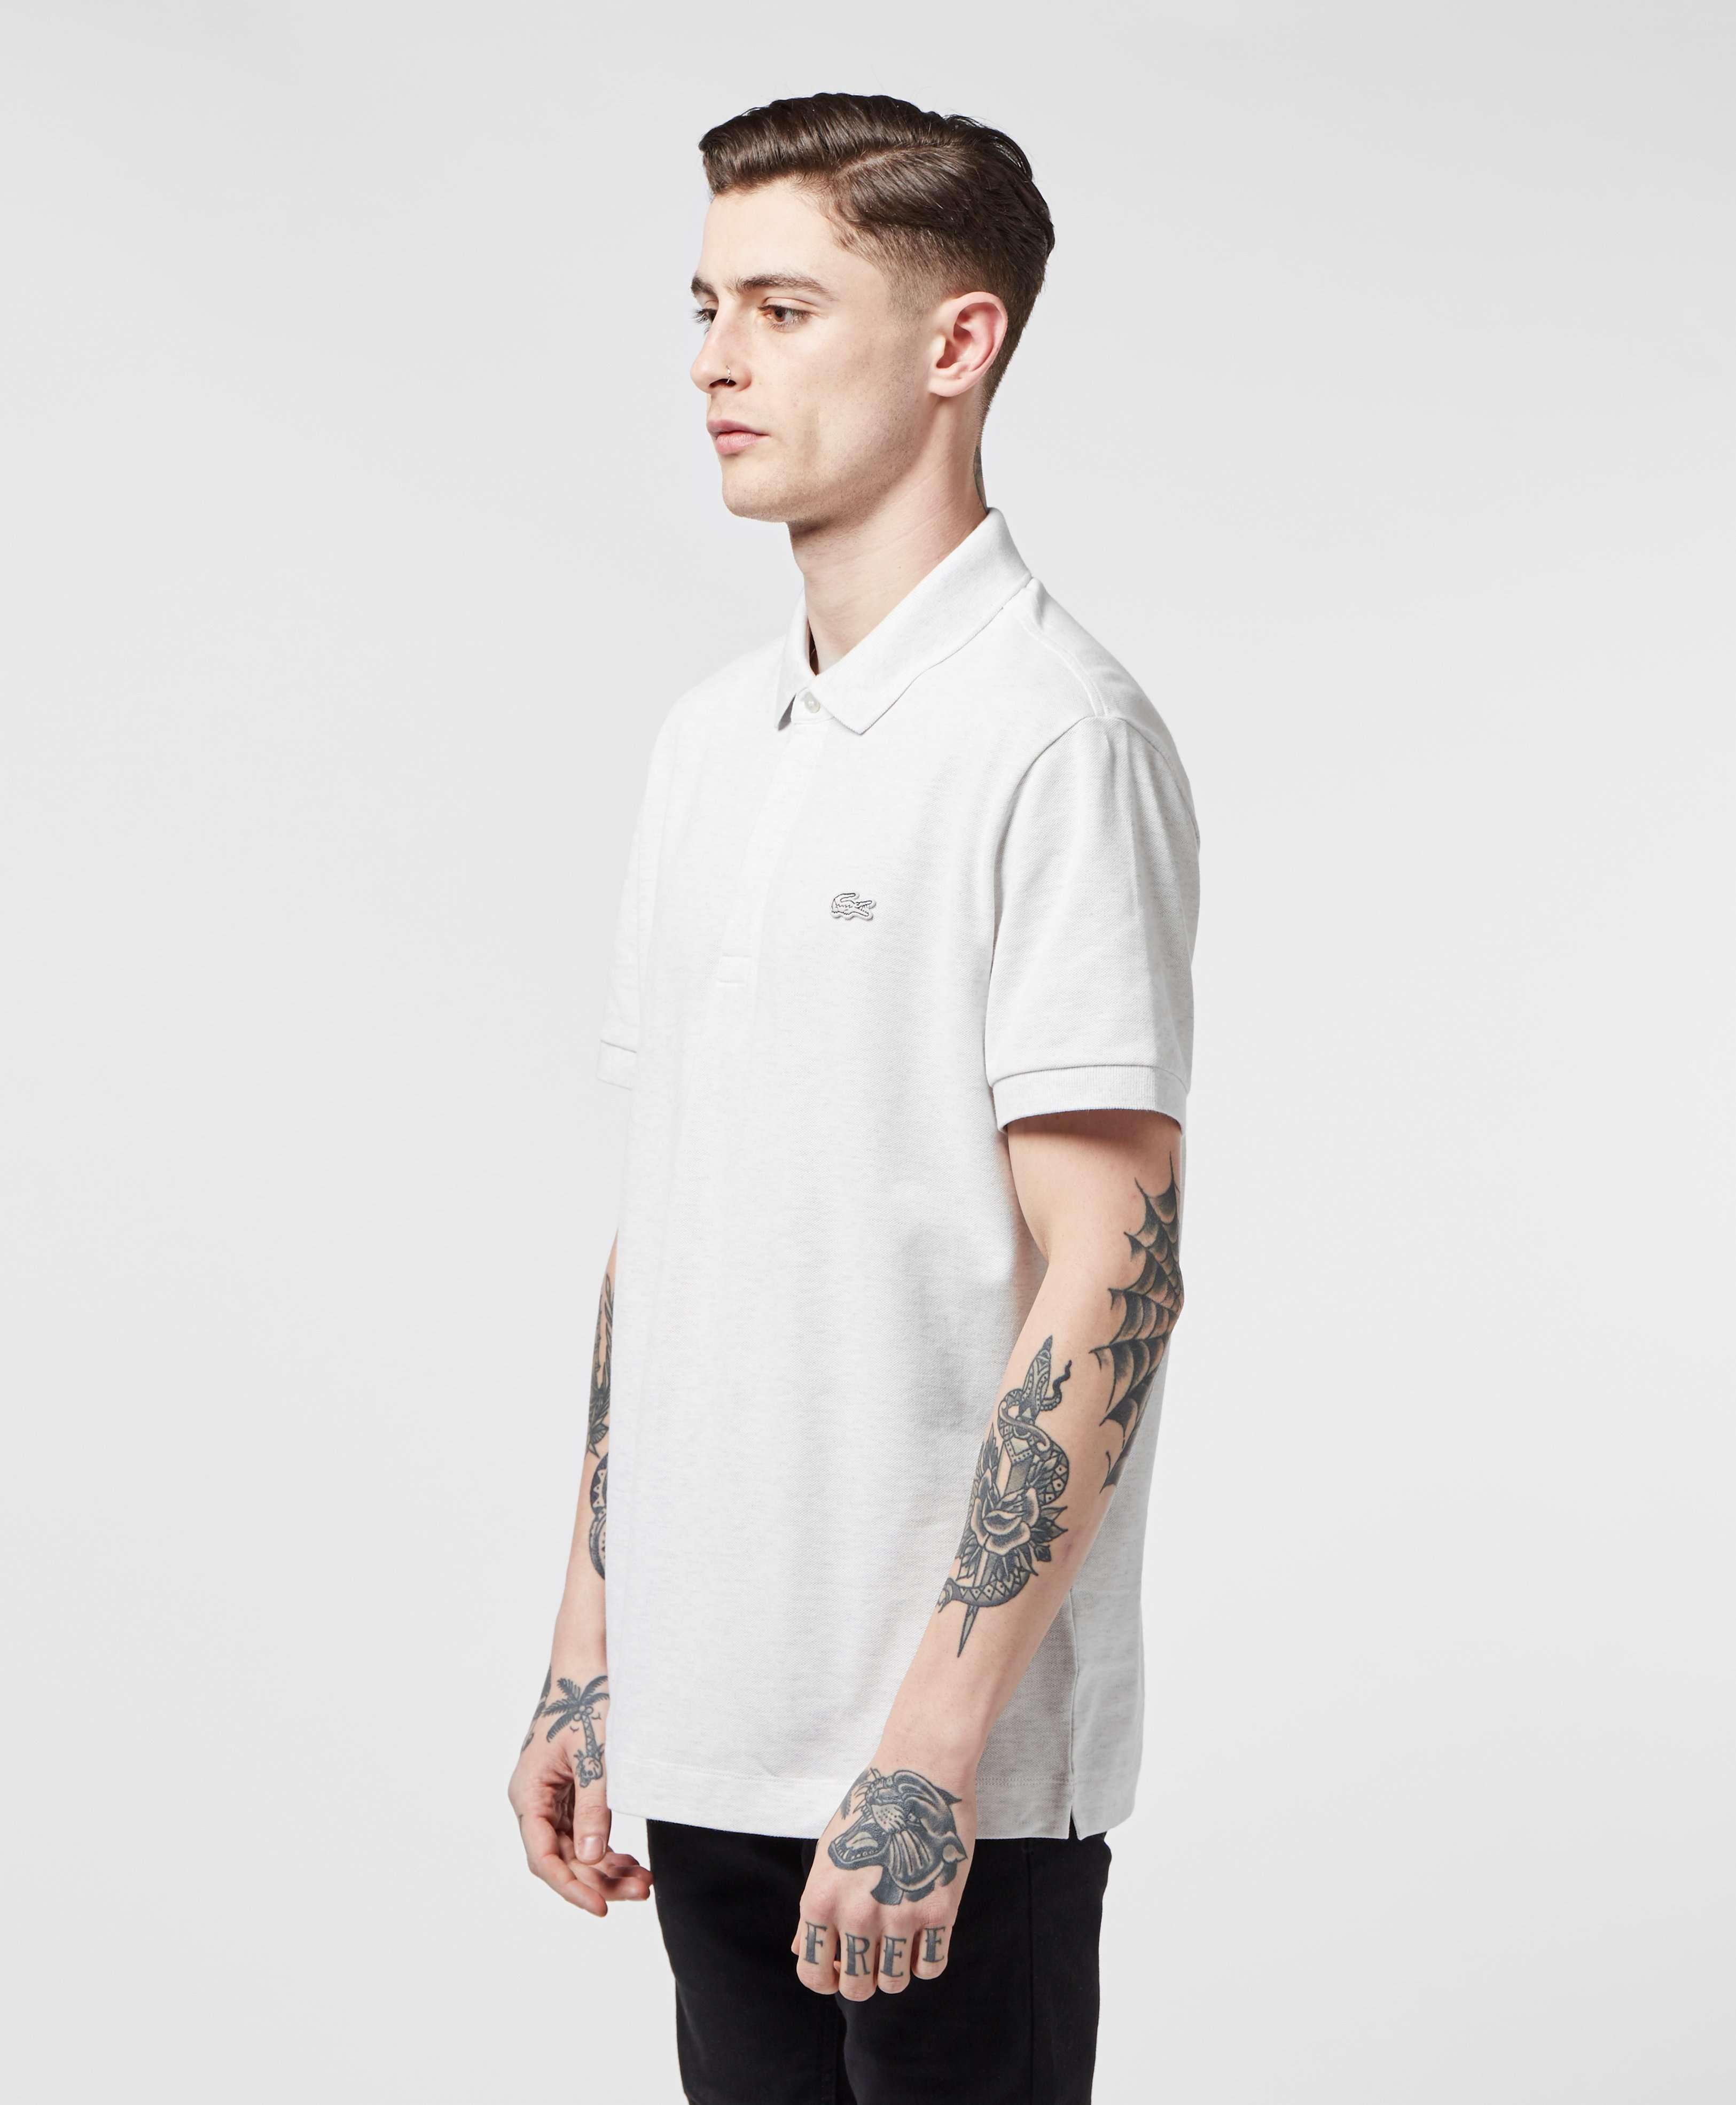 Lacoste Short Sleeve Paris Polo Shirt